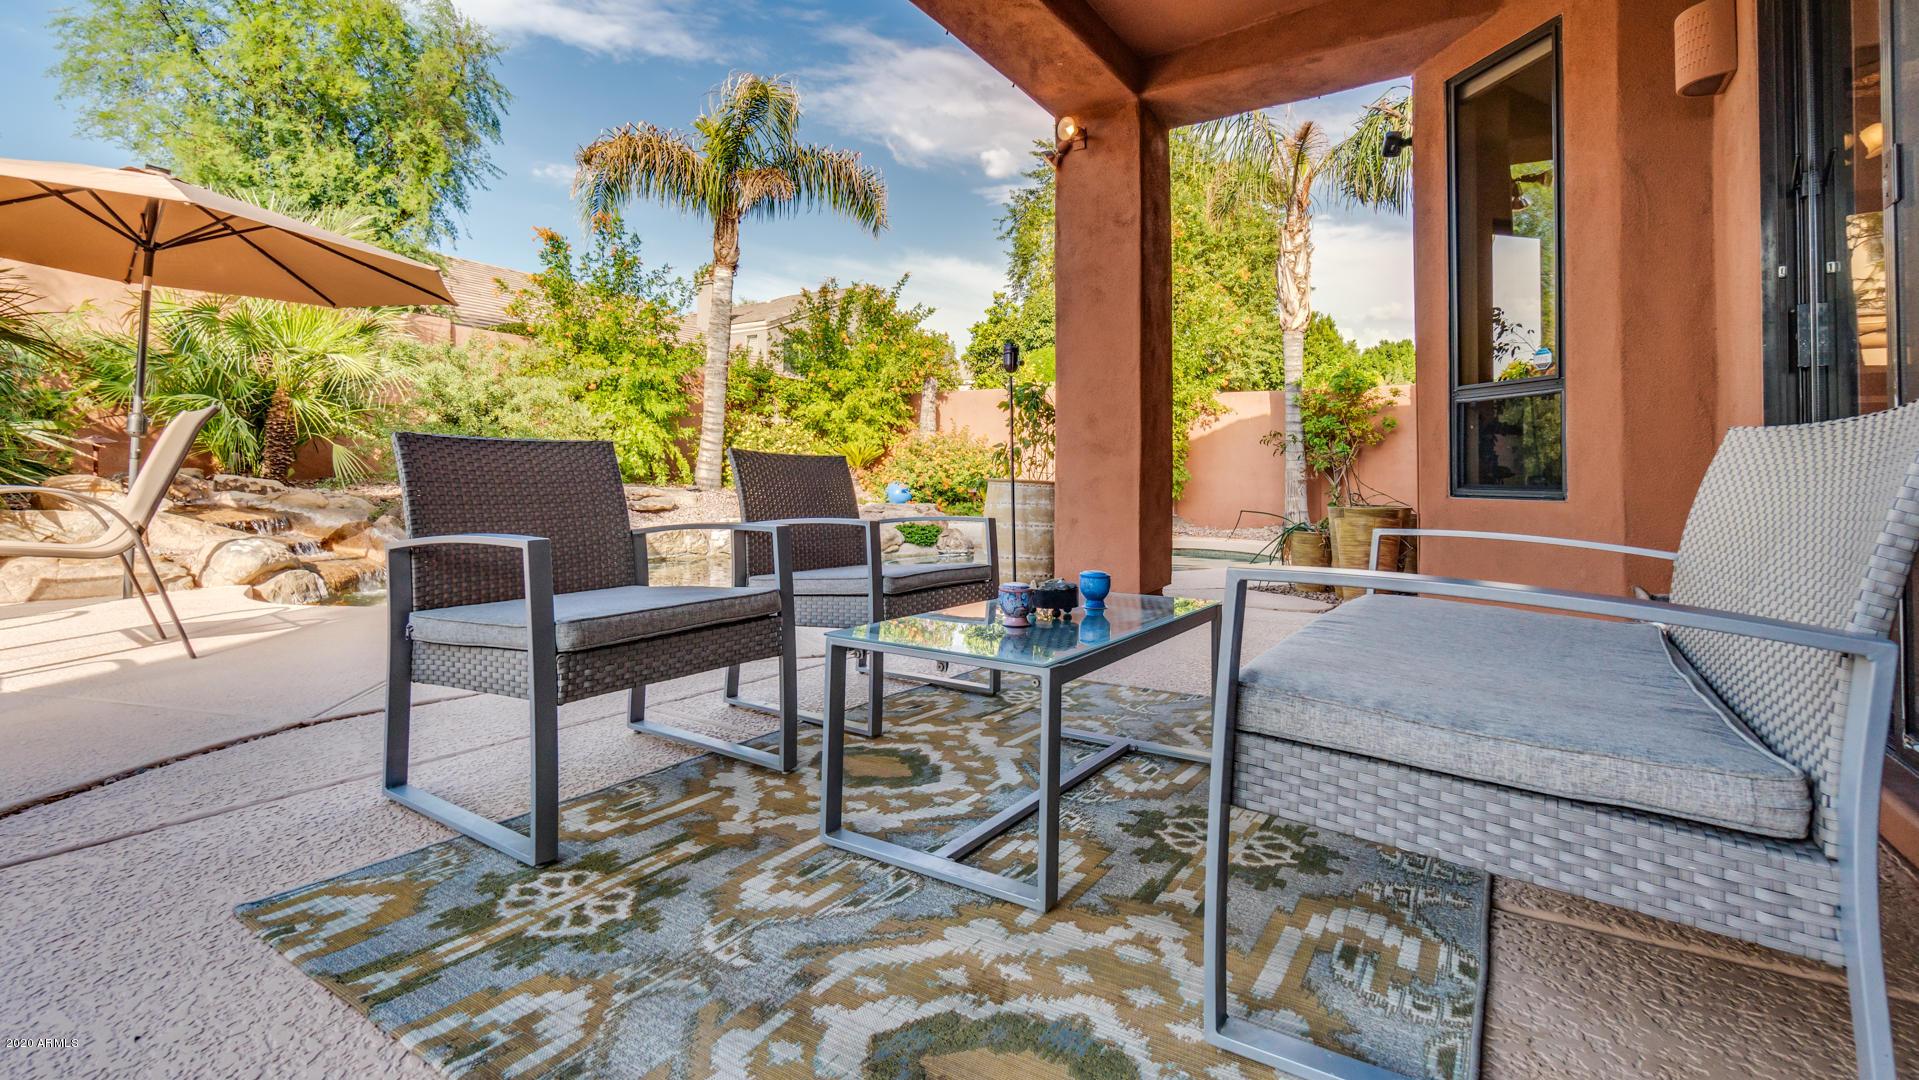 MLS 6148949 9684 E SHARON Drive, Scottsdale, AZ 85260 Scottsdale AZ Camelot Ranch